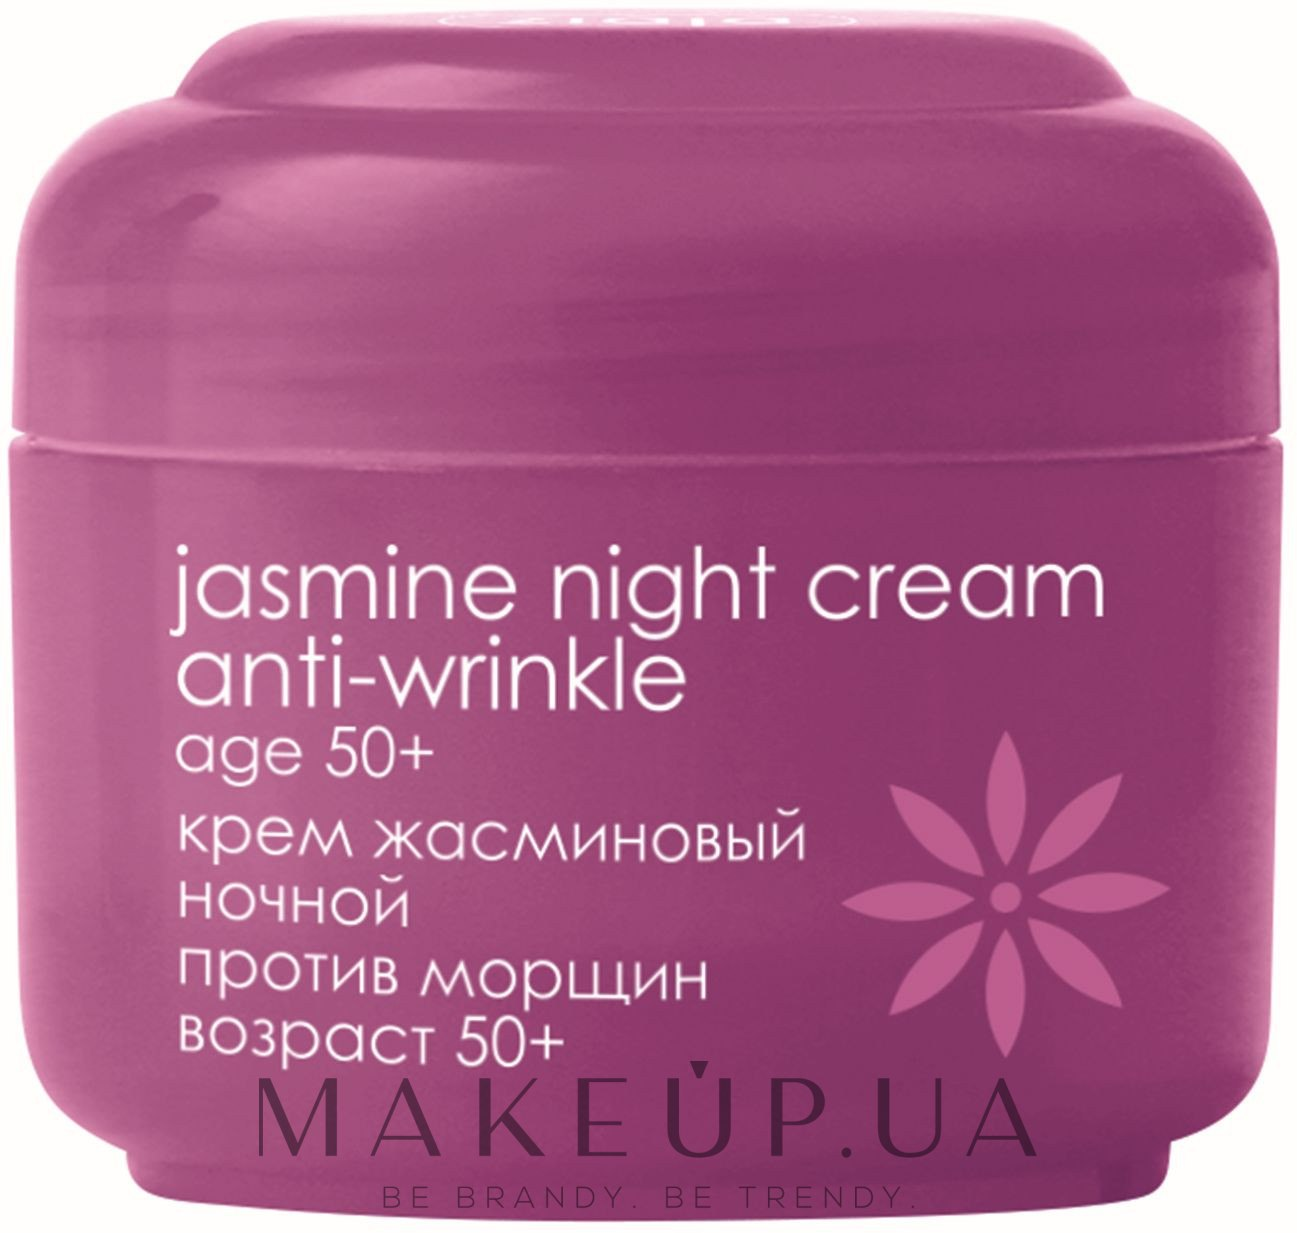 night face cream ночной крем от морщин